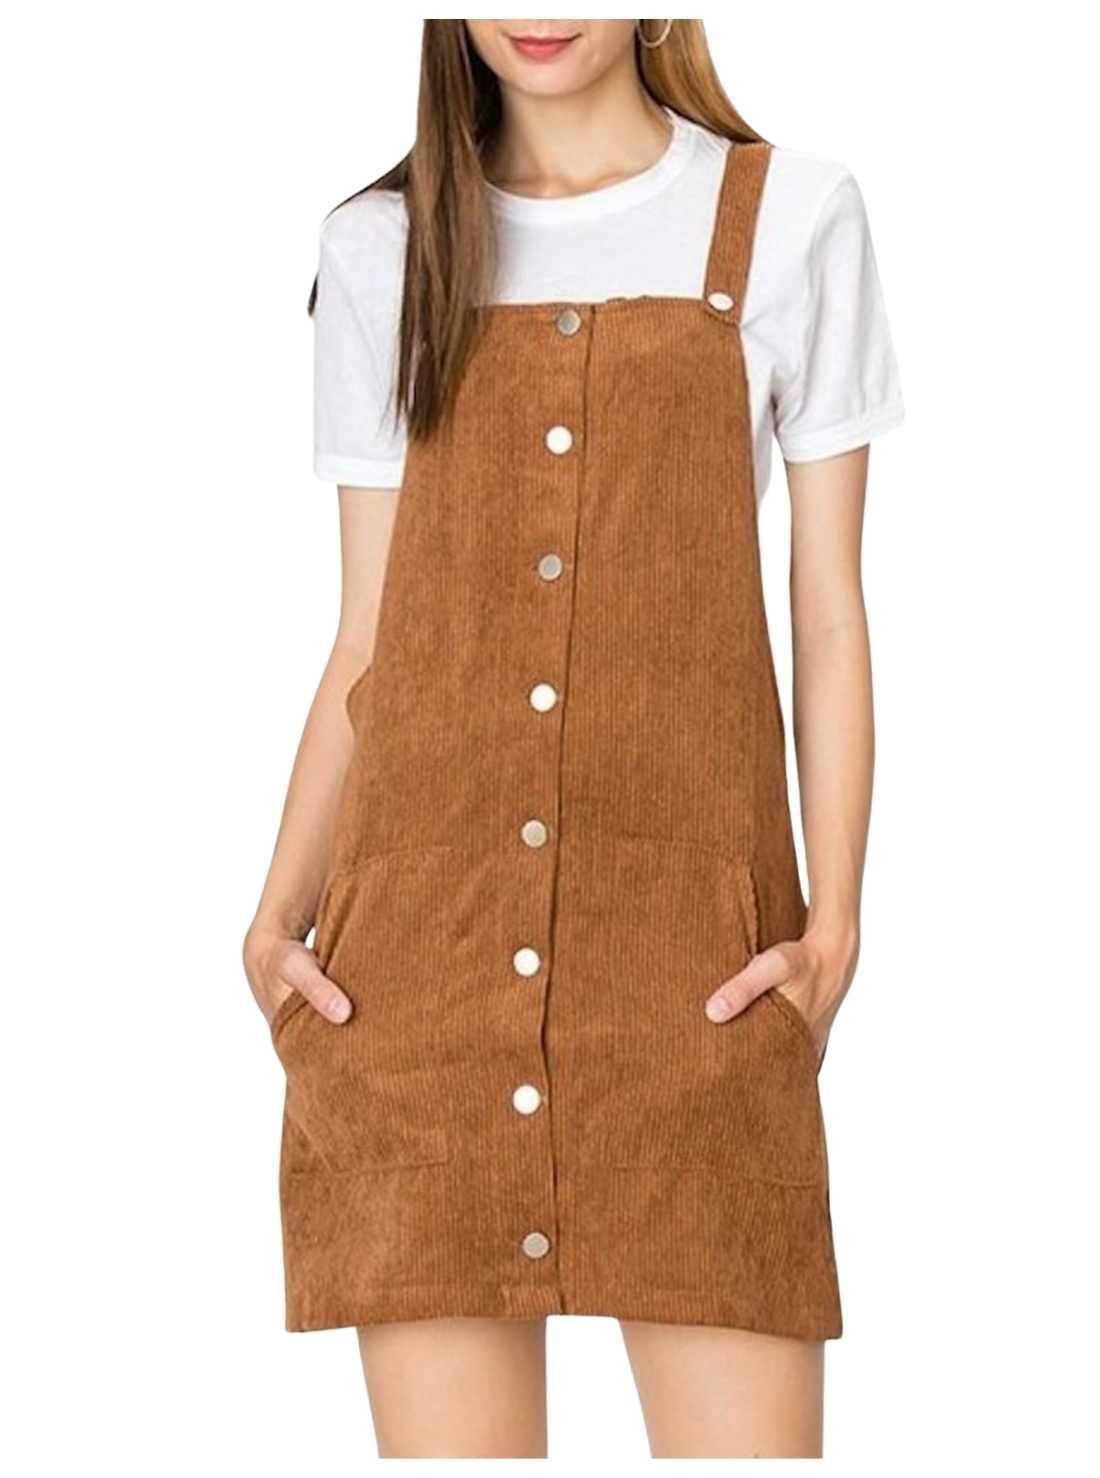 Jumper Dress Brown